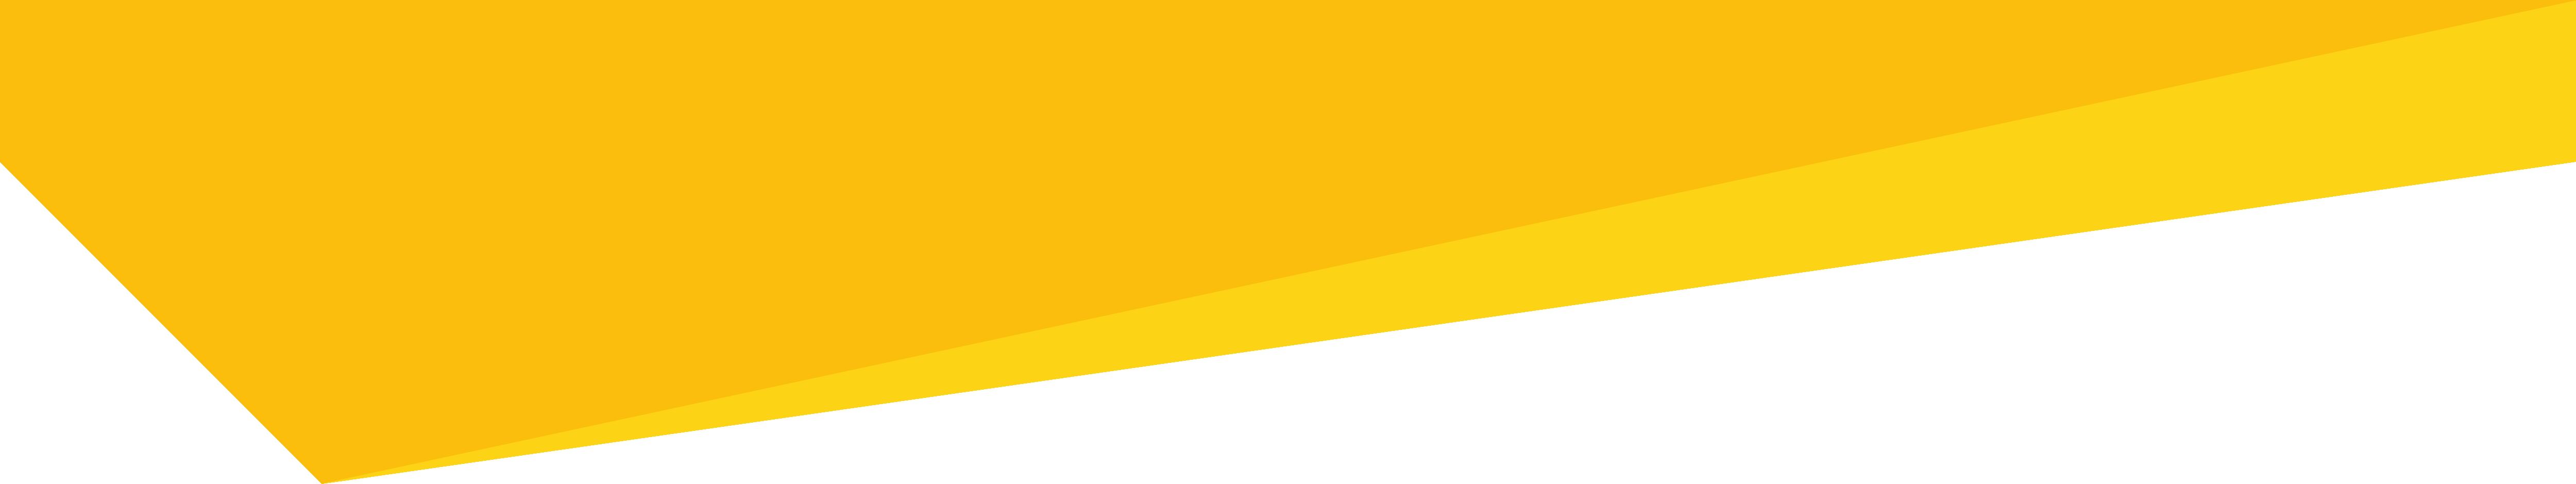 Dreieck Gelb